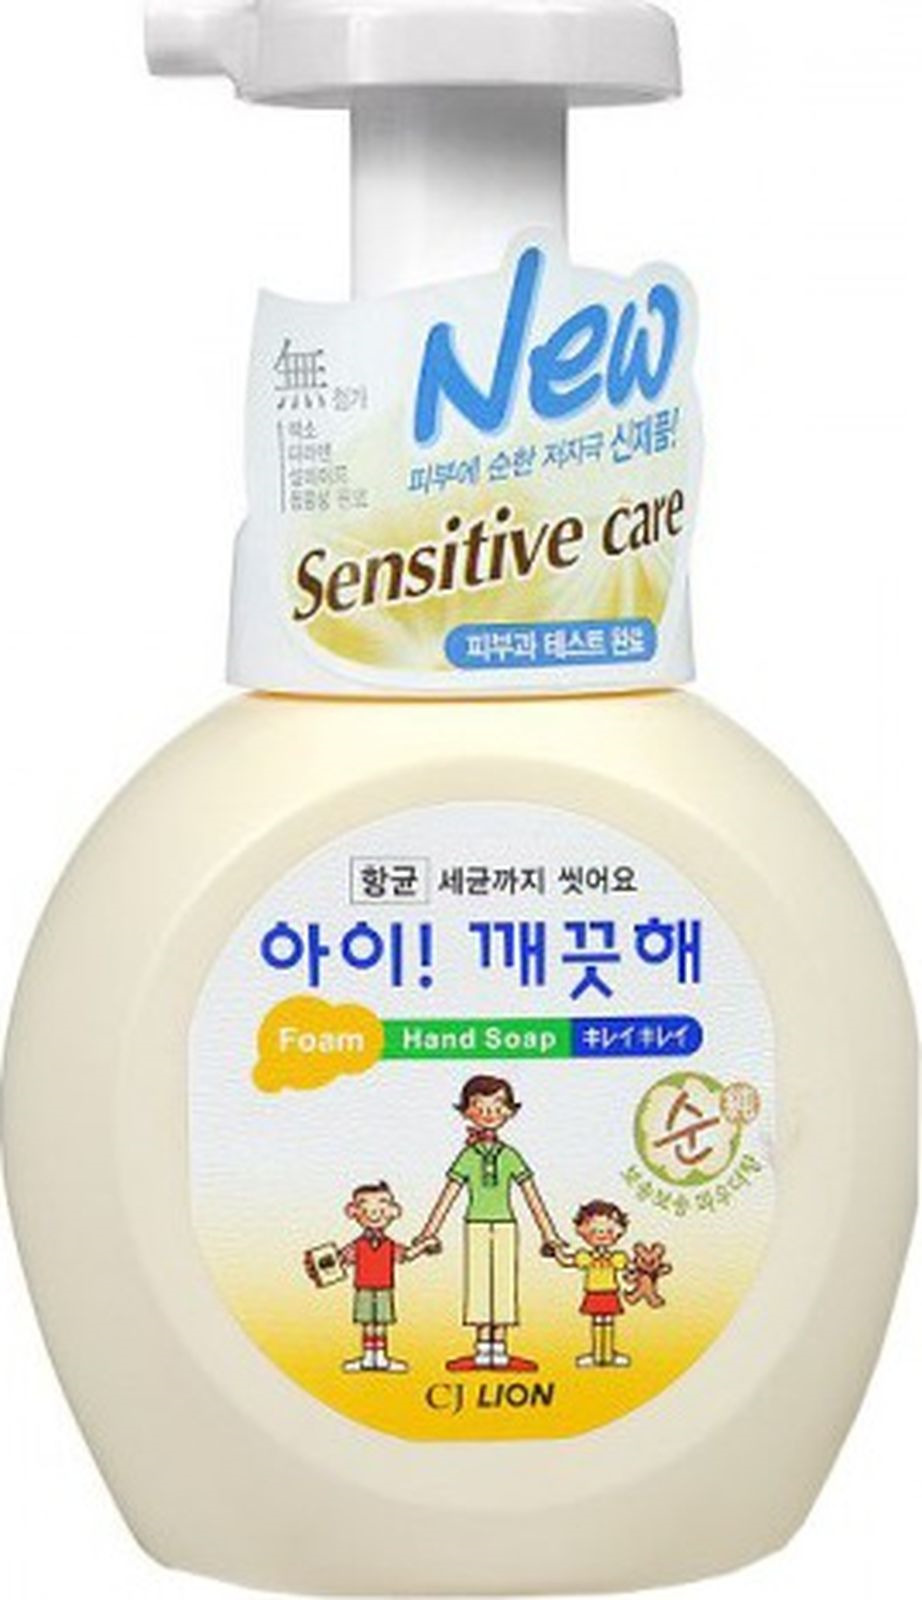 Жидкое мыло CJ Lion Ai-Kekute, с ароматом лимона, 250 мл